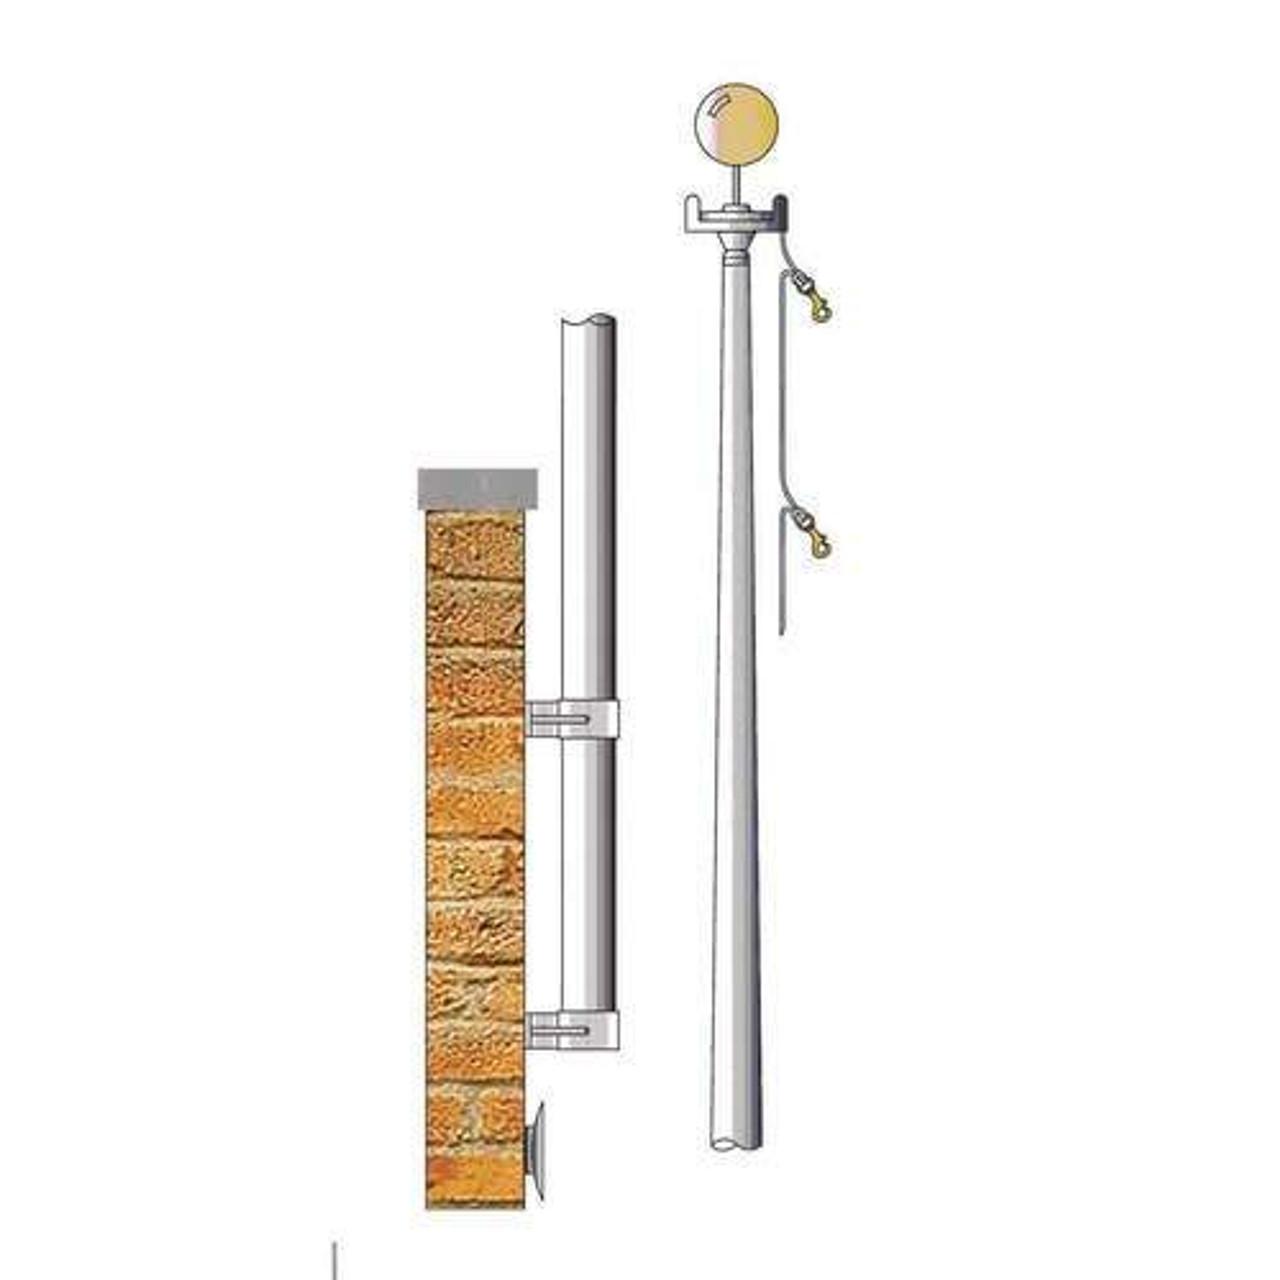 20 Vertical Wall Mounted Flagpole EVWM20